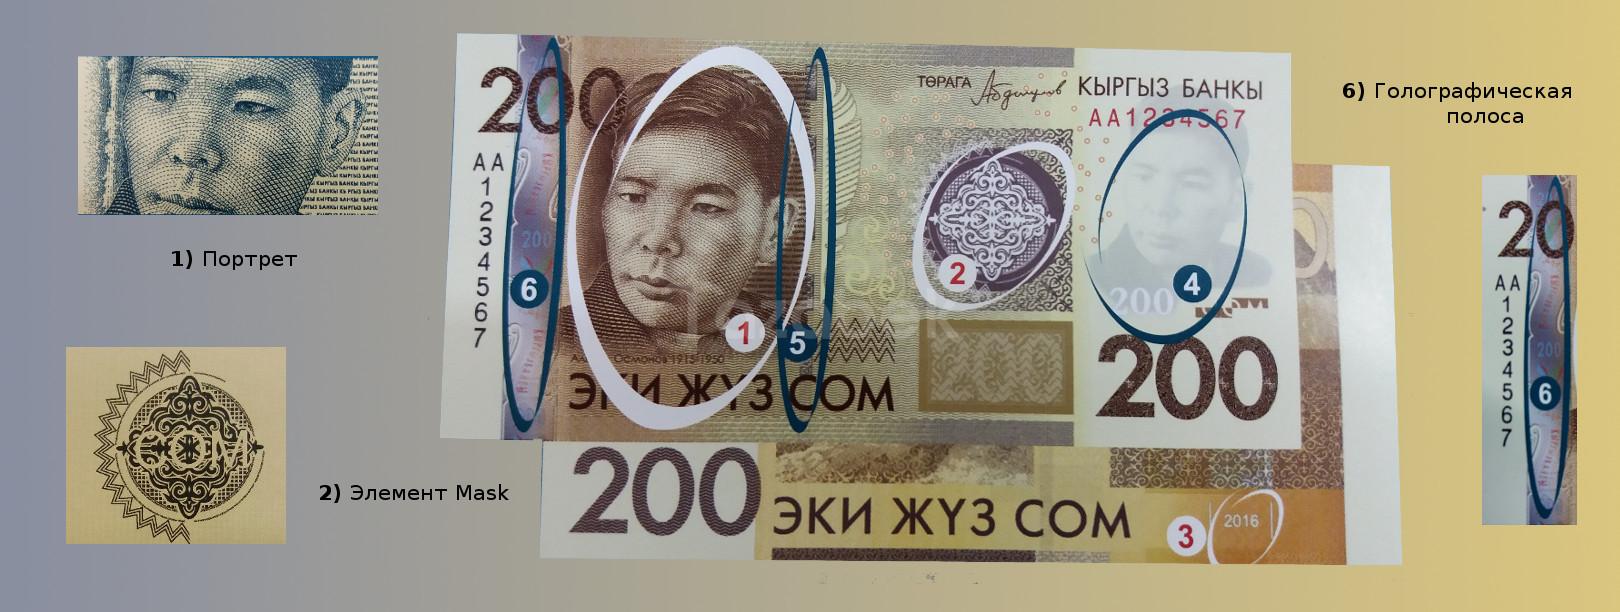 Валюта Кыргызстана - банкнота номиналом 200 сомов образца 2017 года. АКИpress